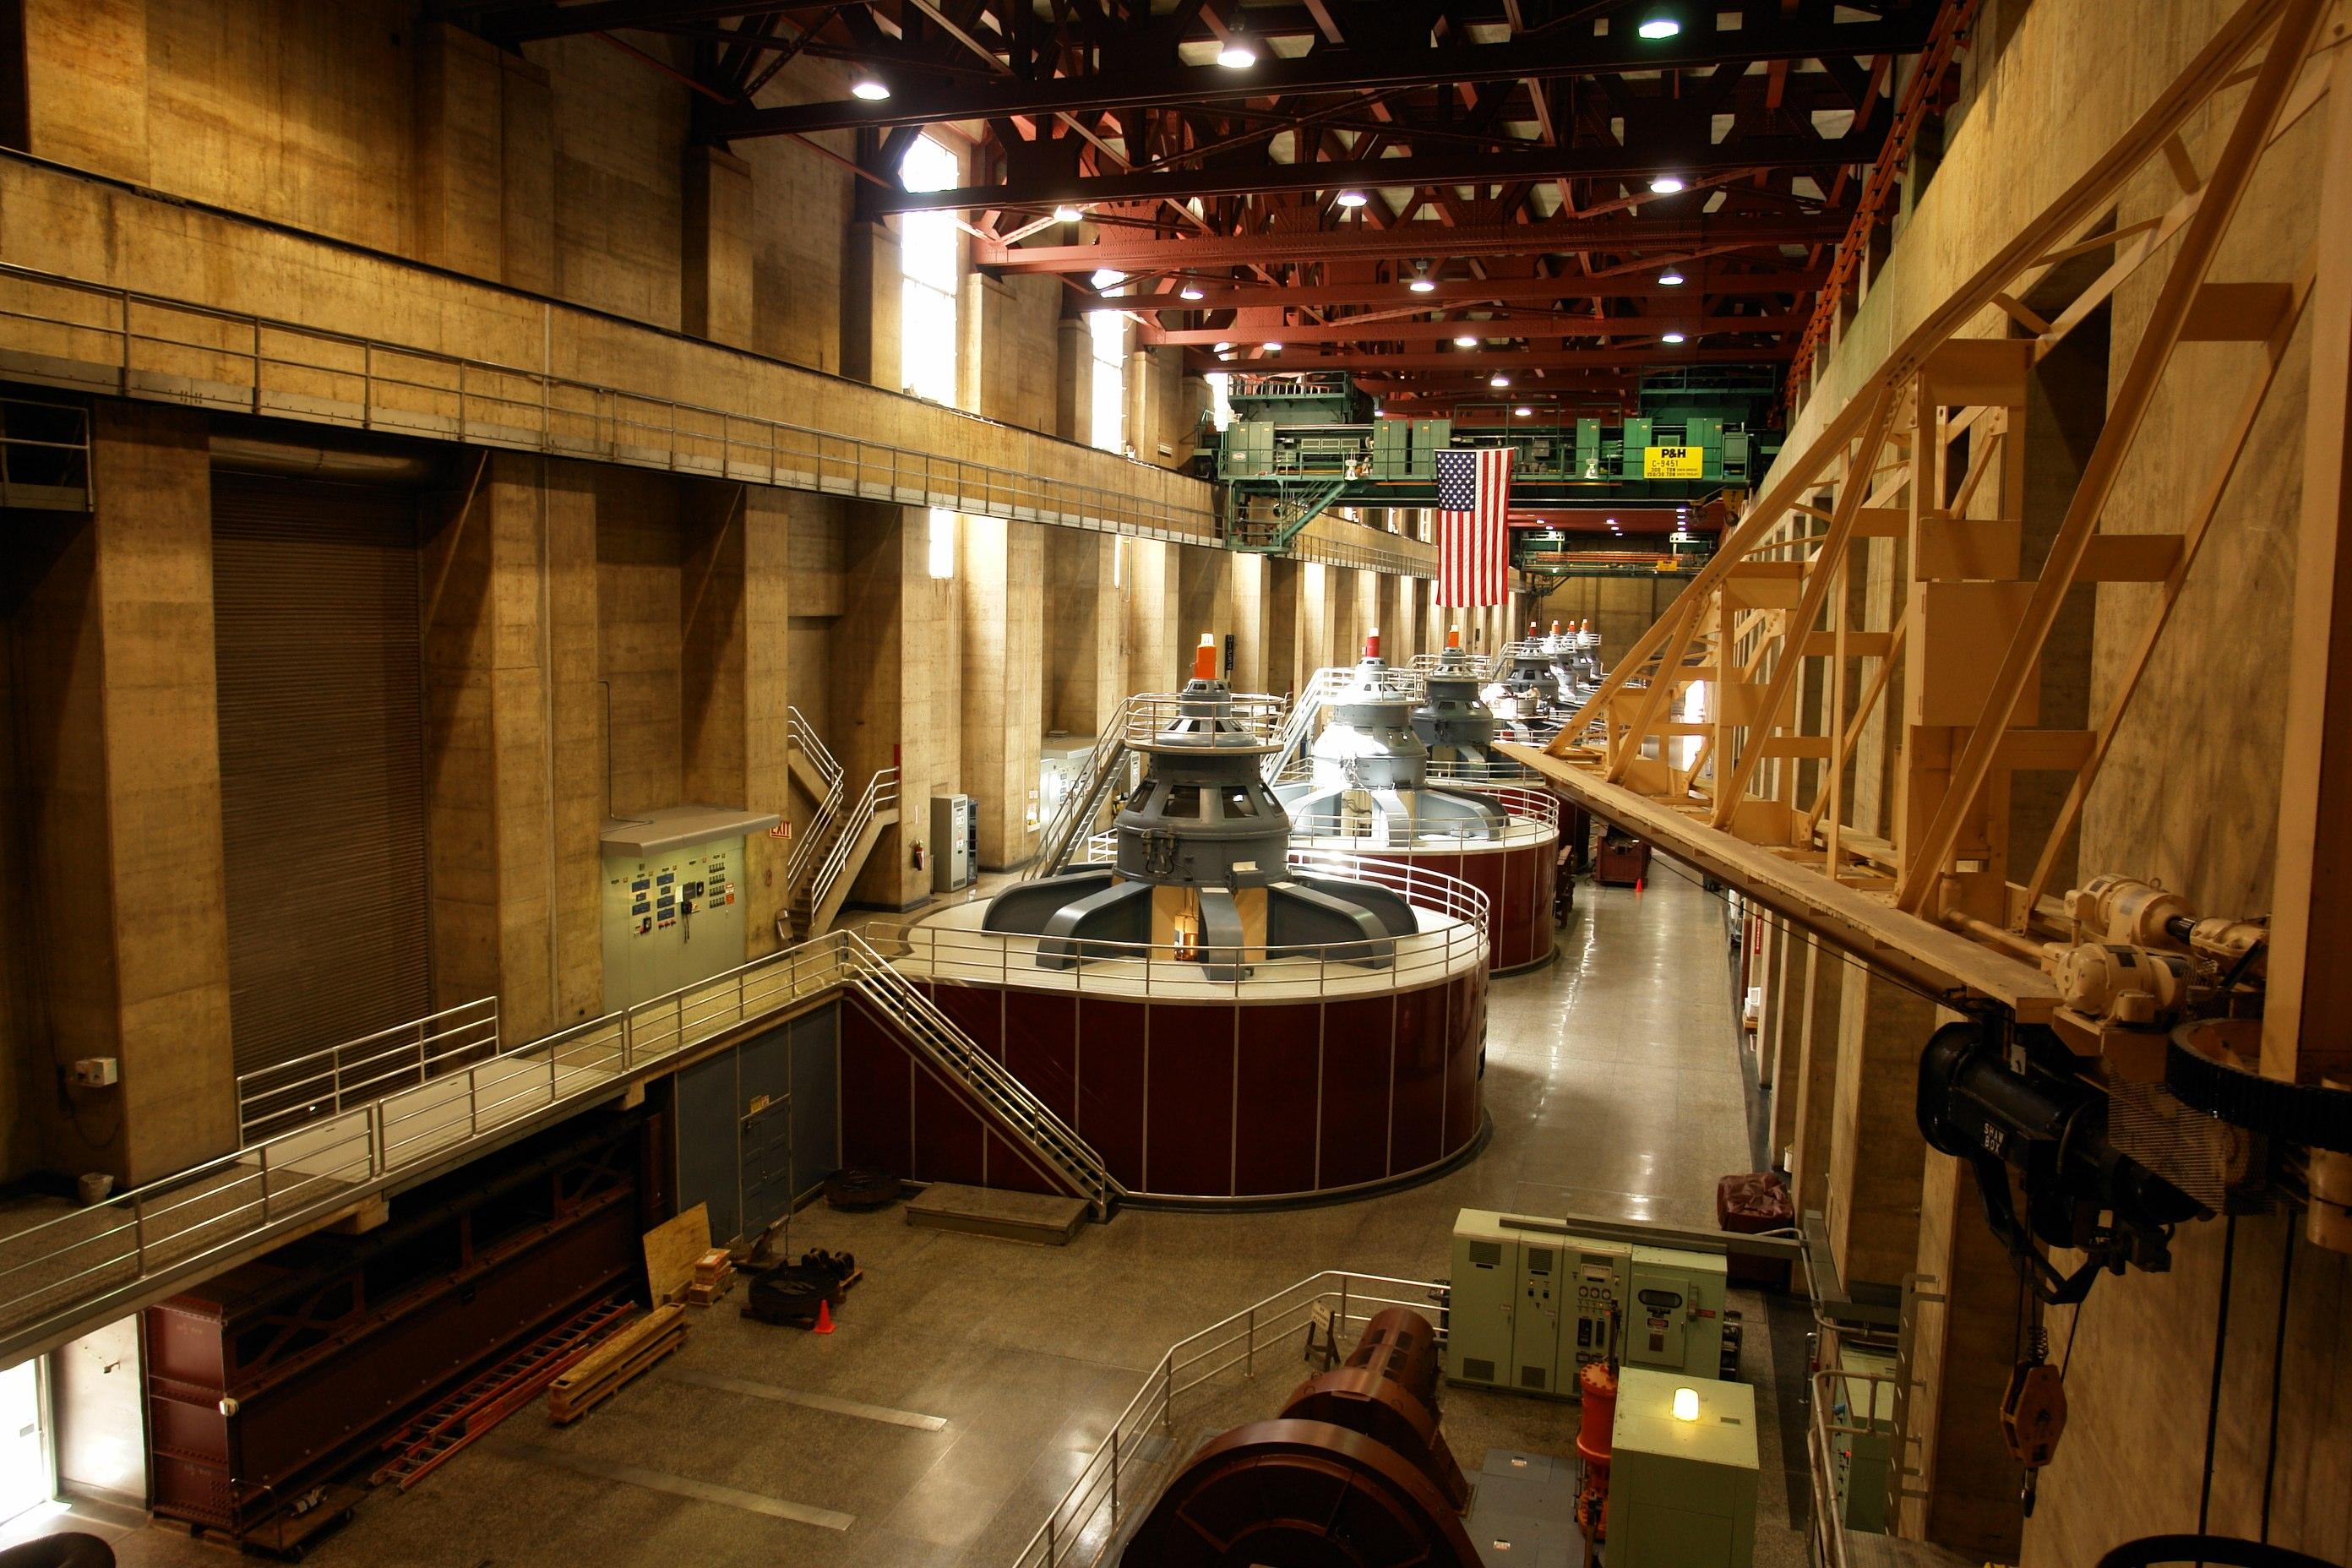 File Generators Inside Hoover Dam The Tour 3467682551